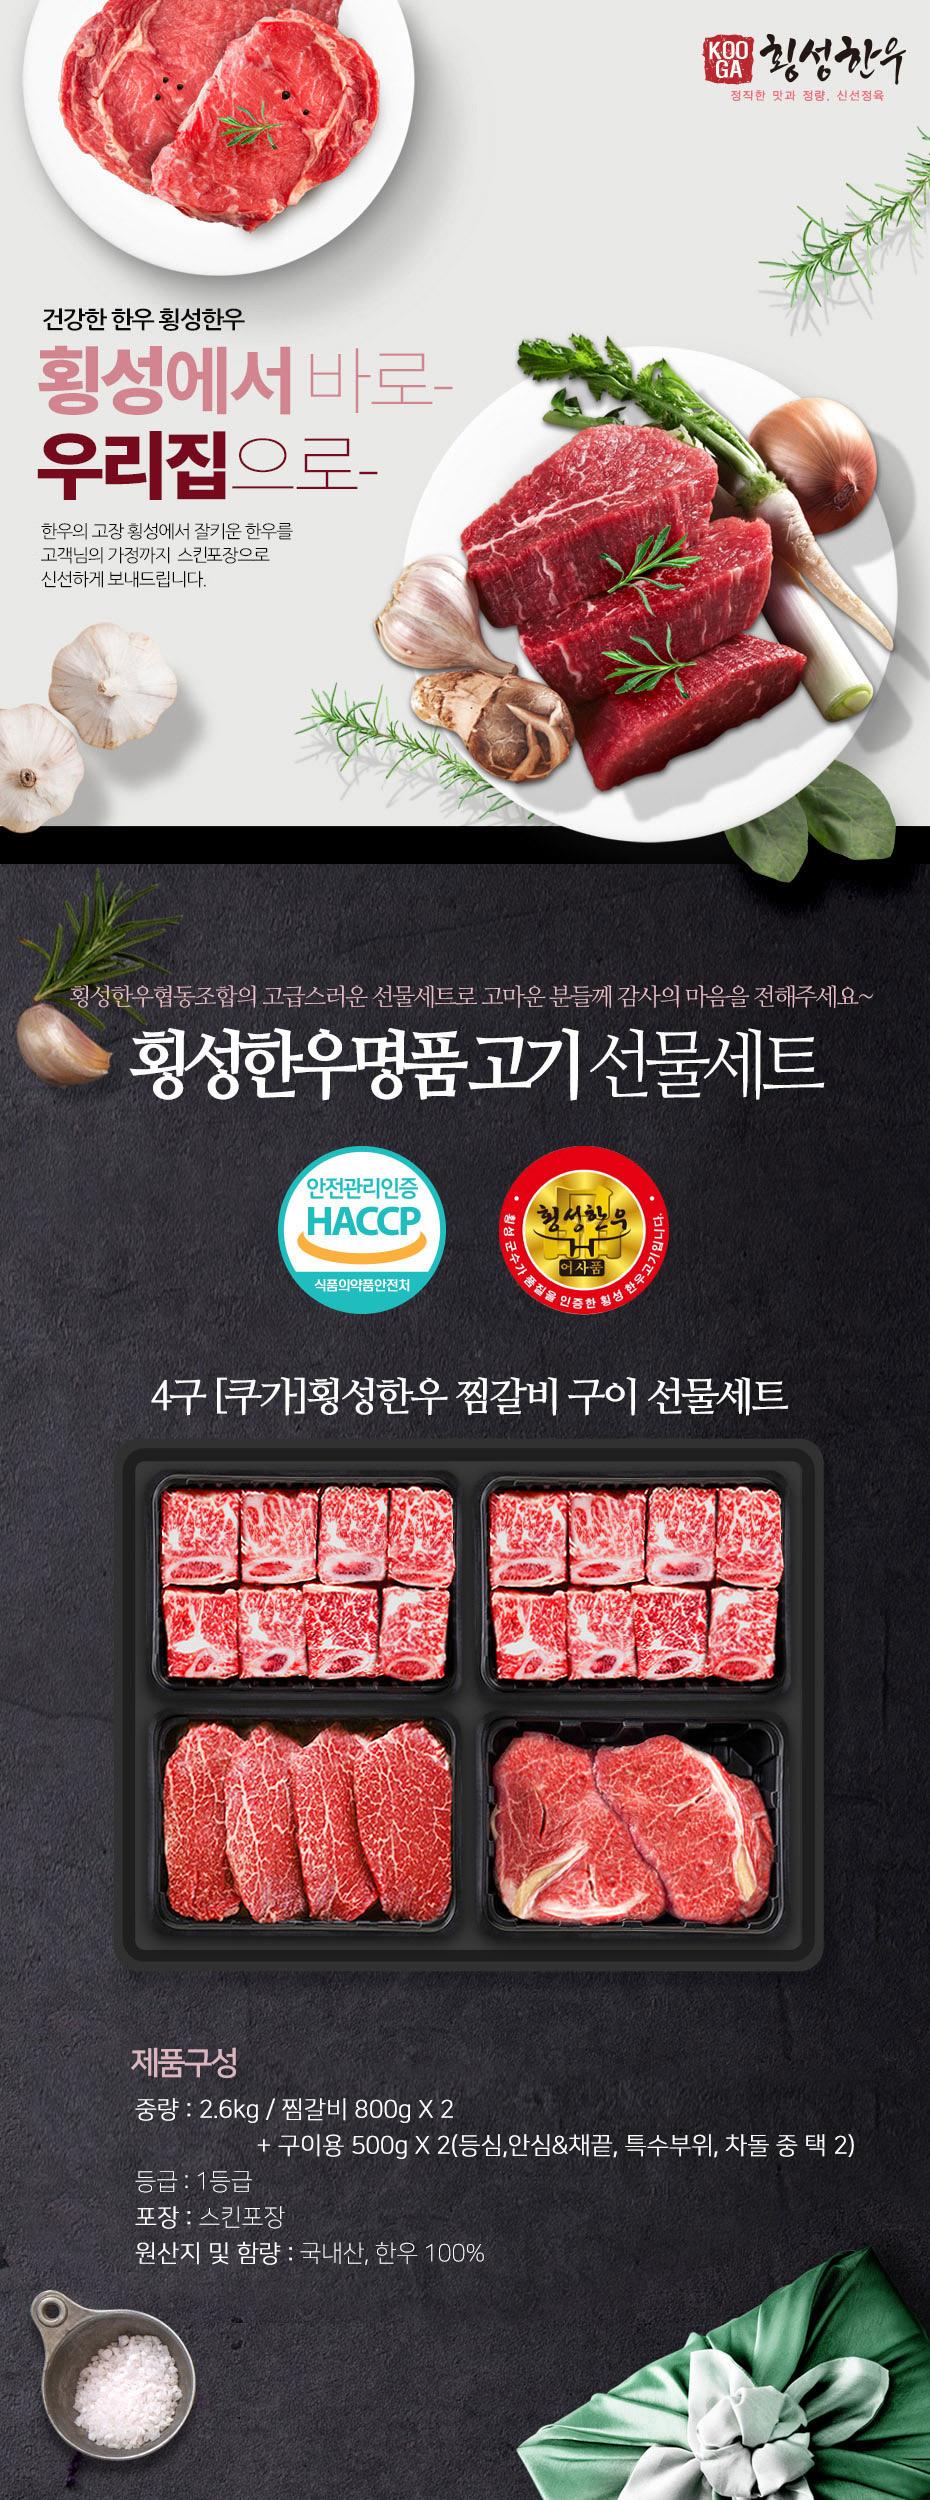 set4_meat_rib2_ten_015412.jpg